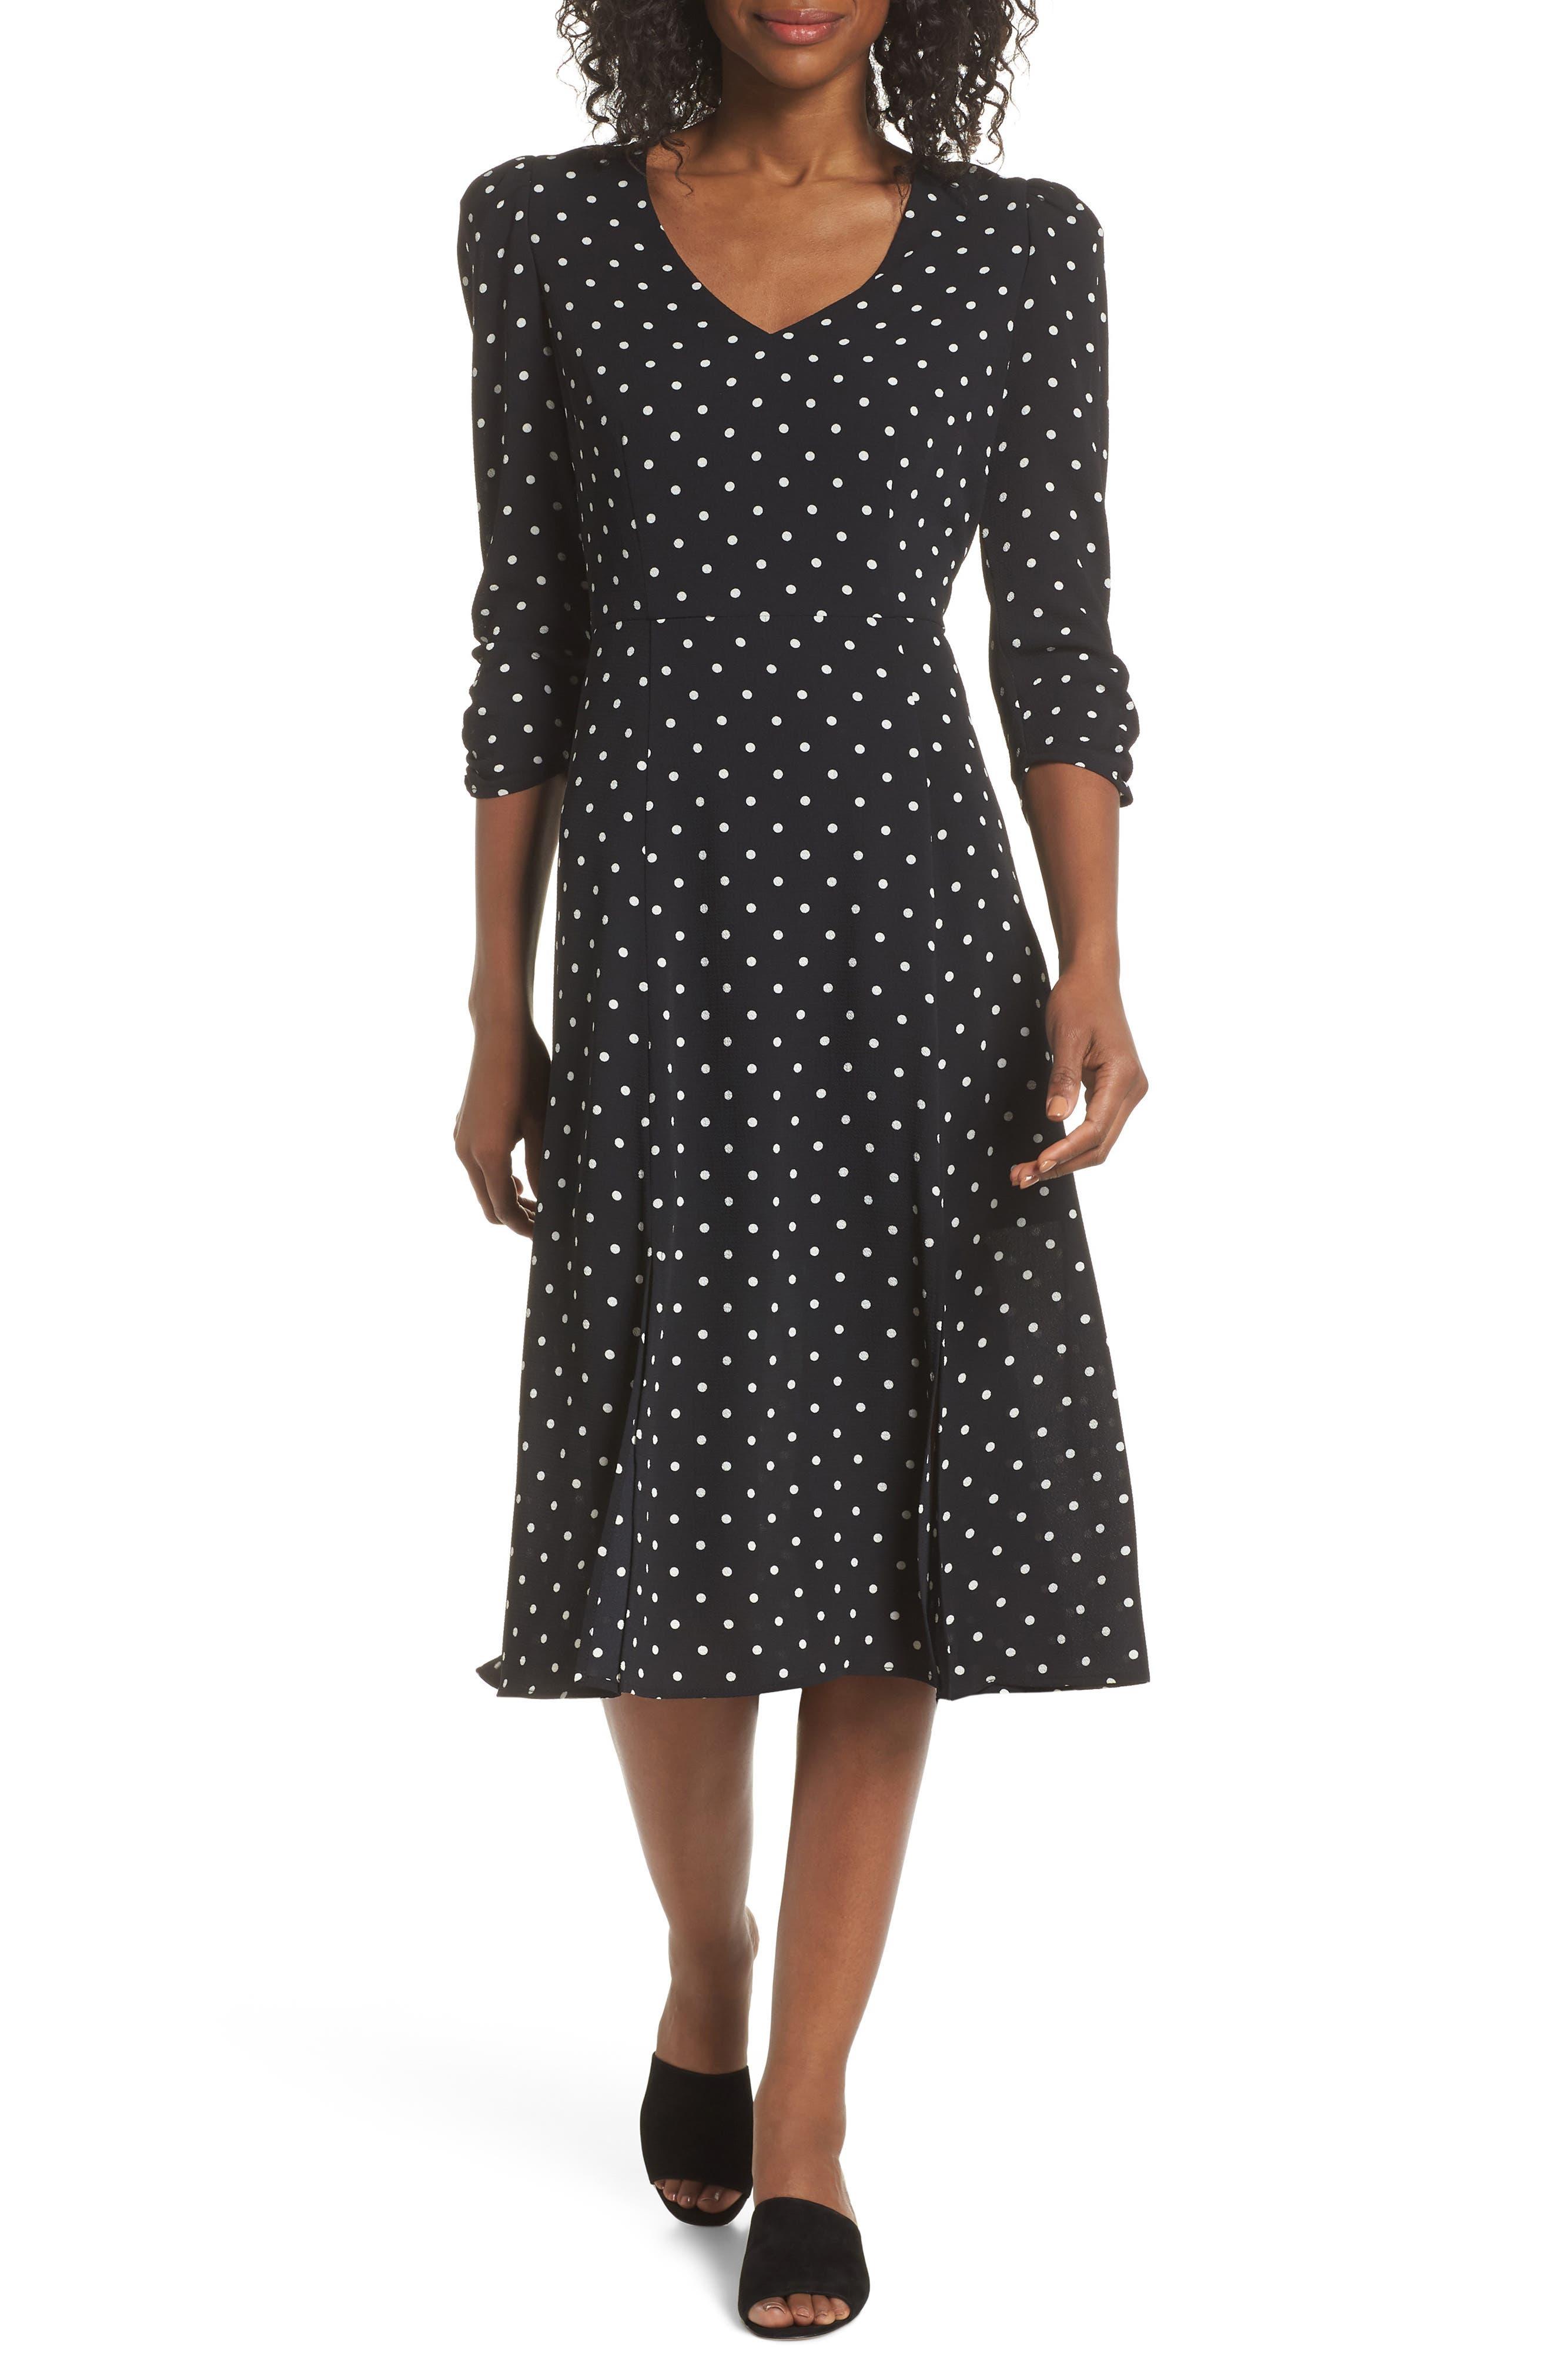 Petite Eliza J Polka Dot Dress, Black